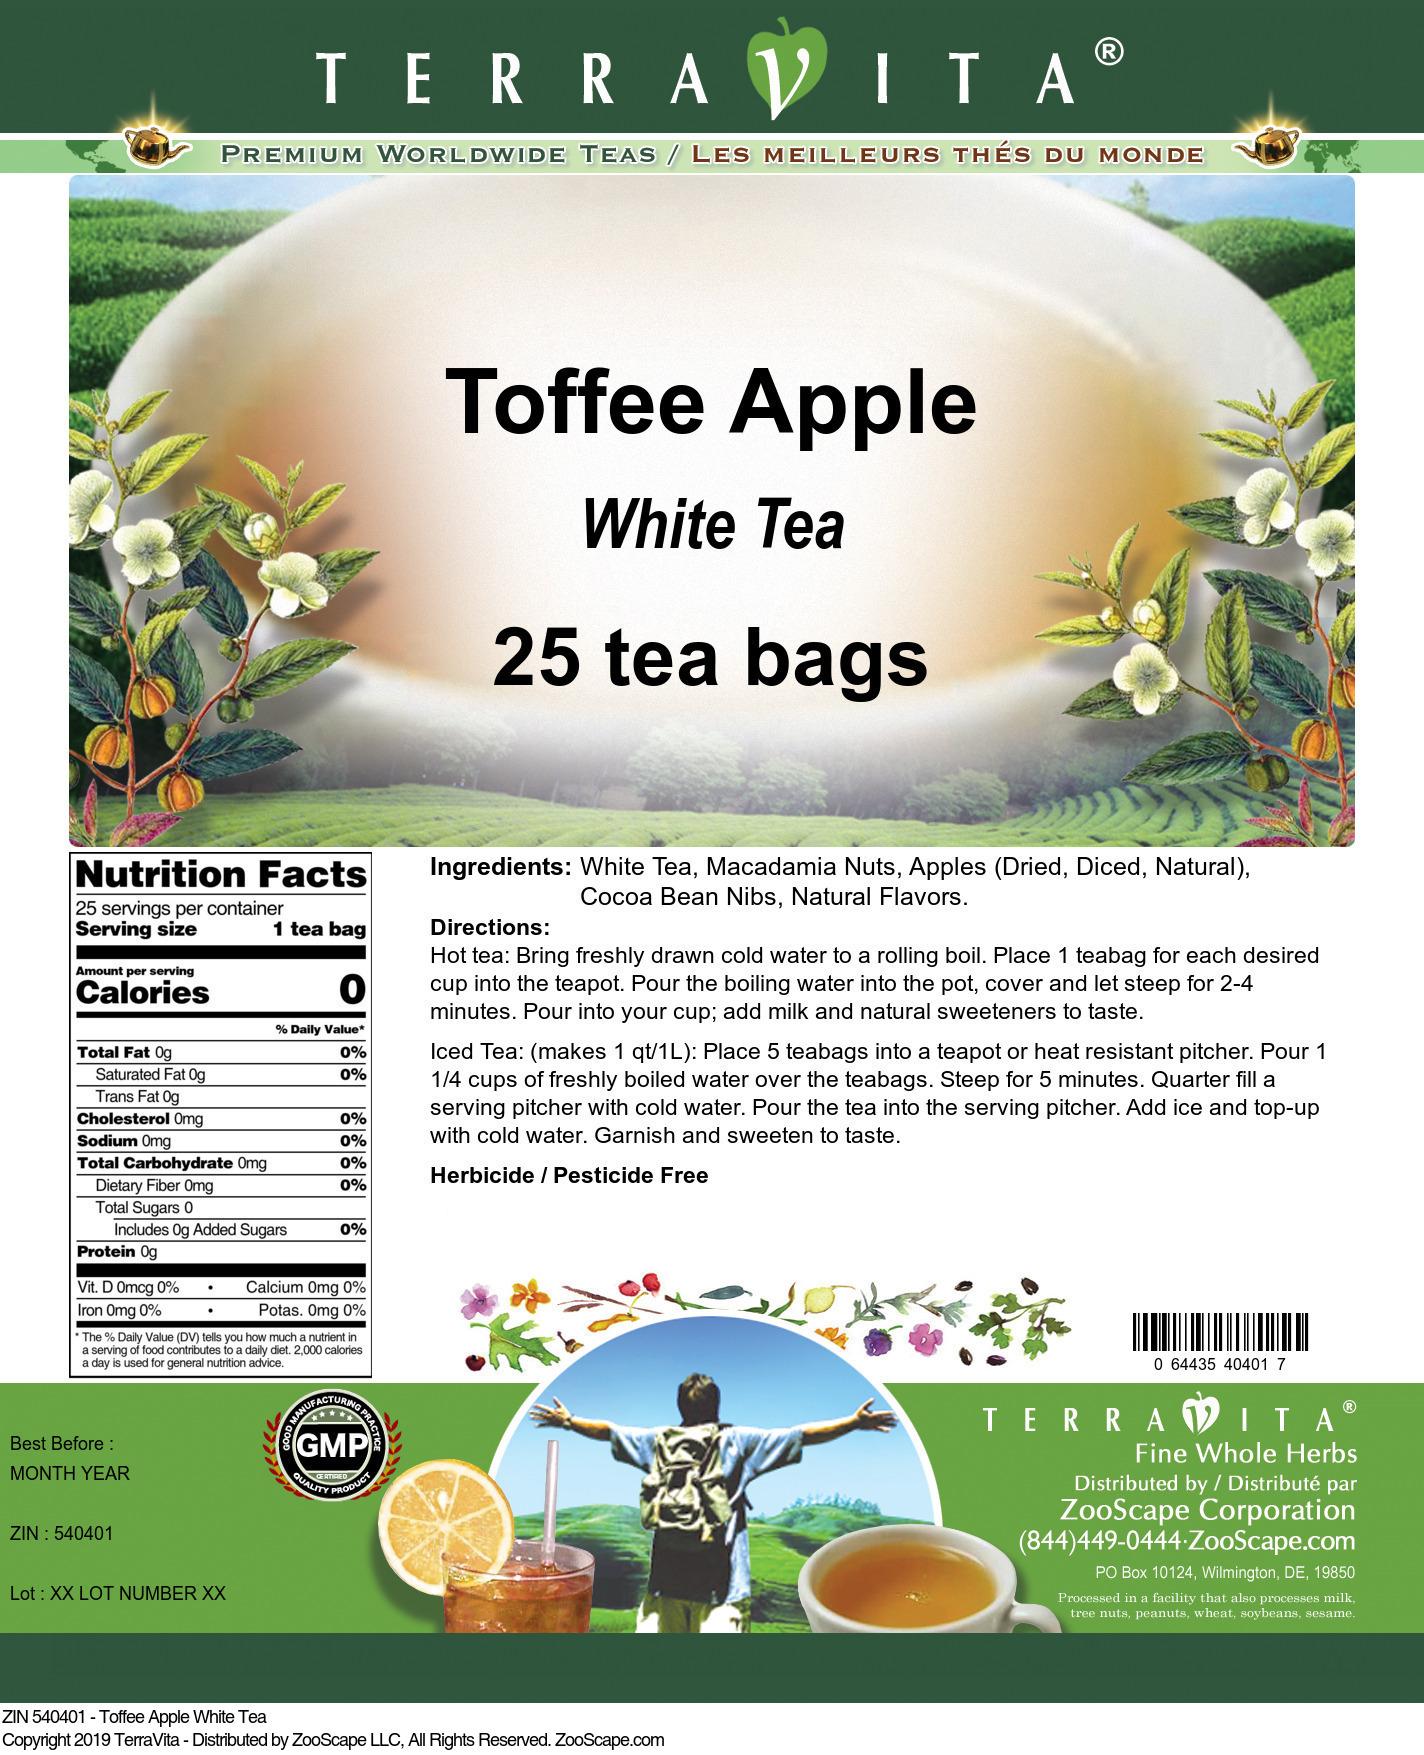 Toffee Apple White Tea